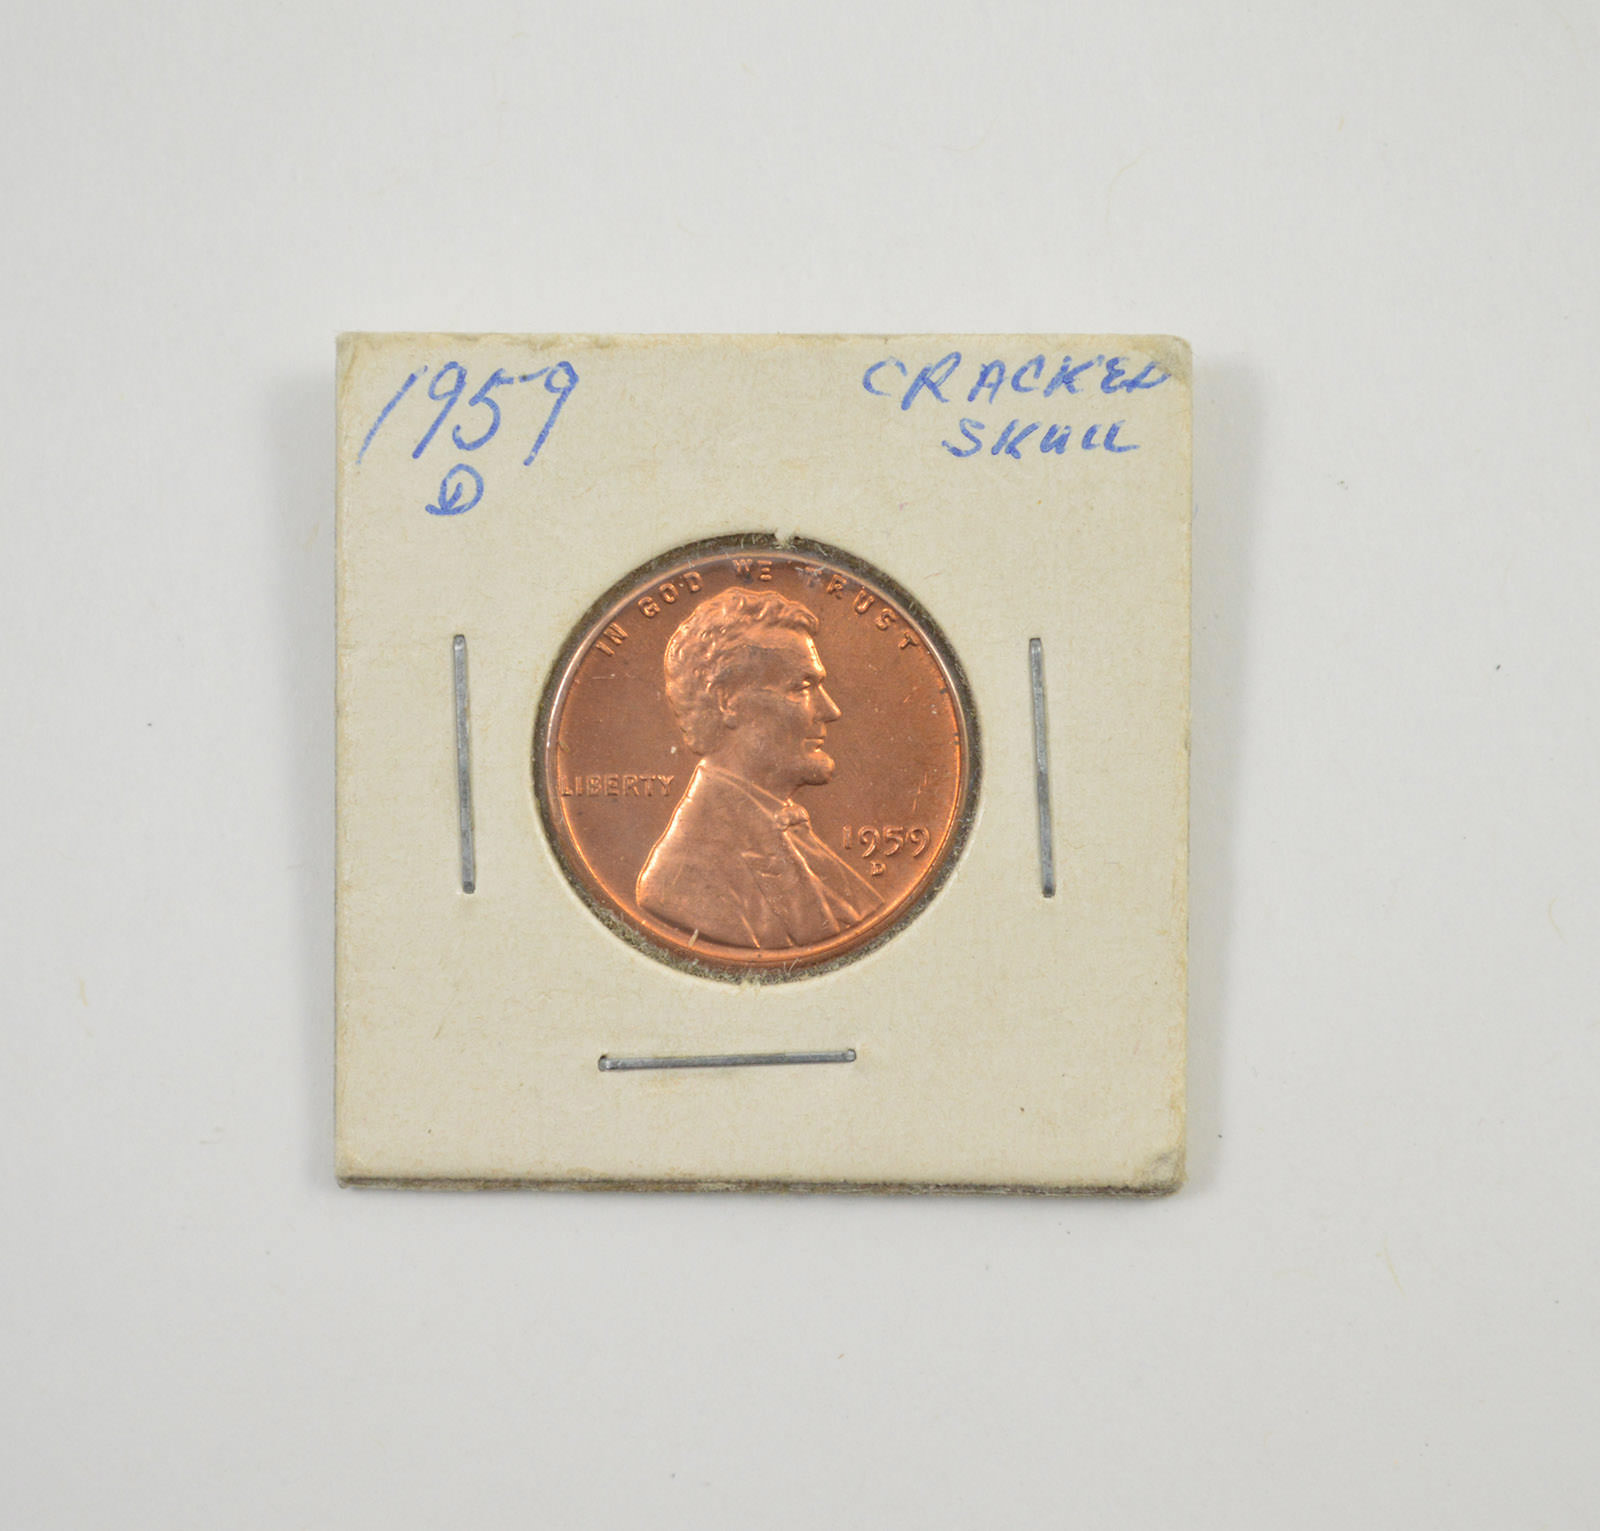 Major Error: 1959-D Lincoln Memorial Cent - Die Crack on